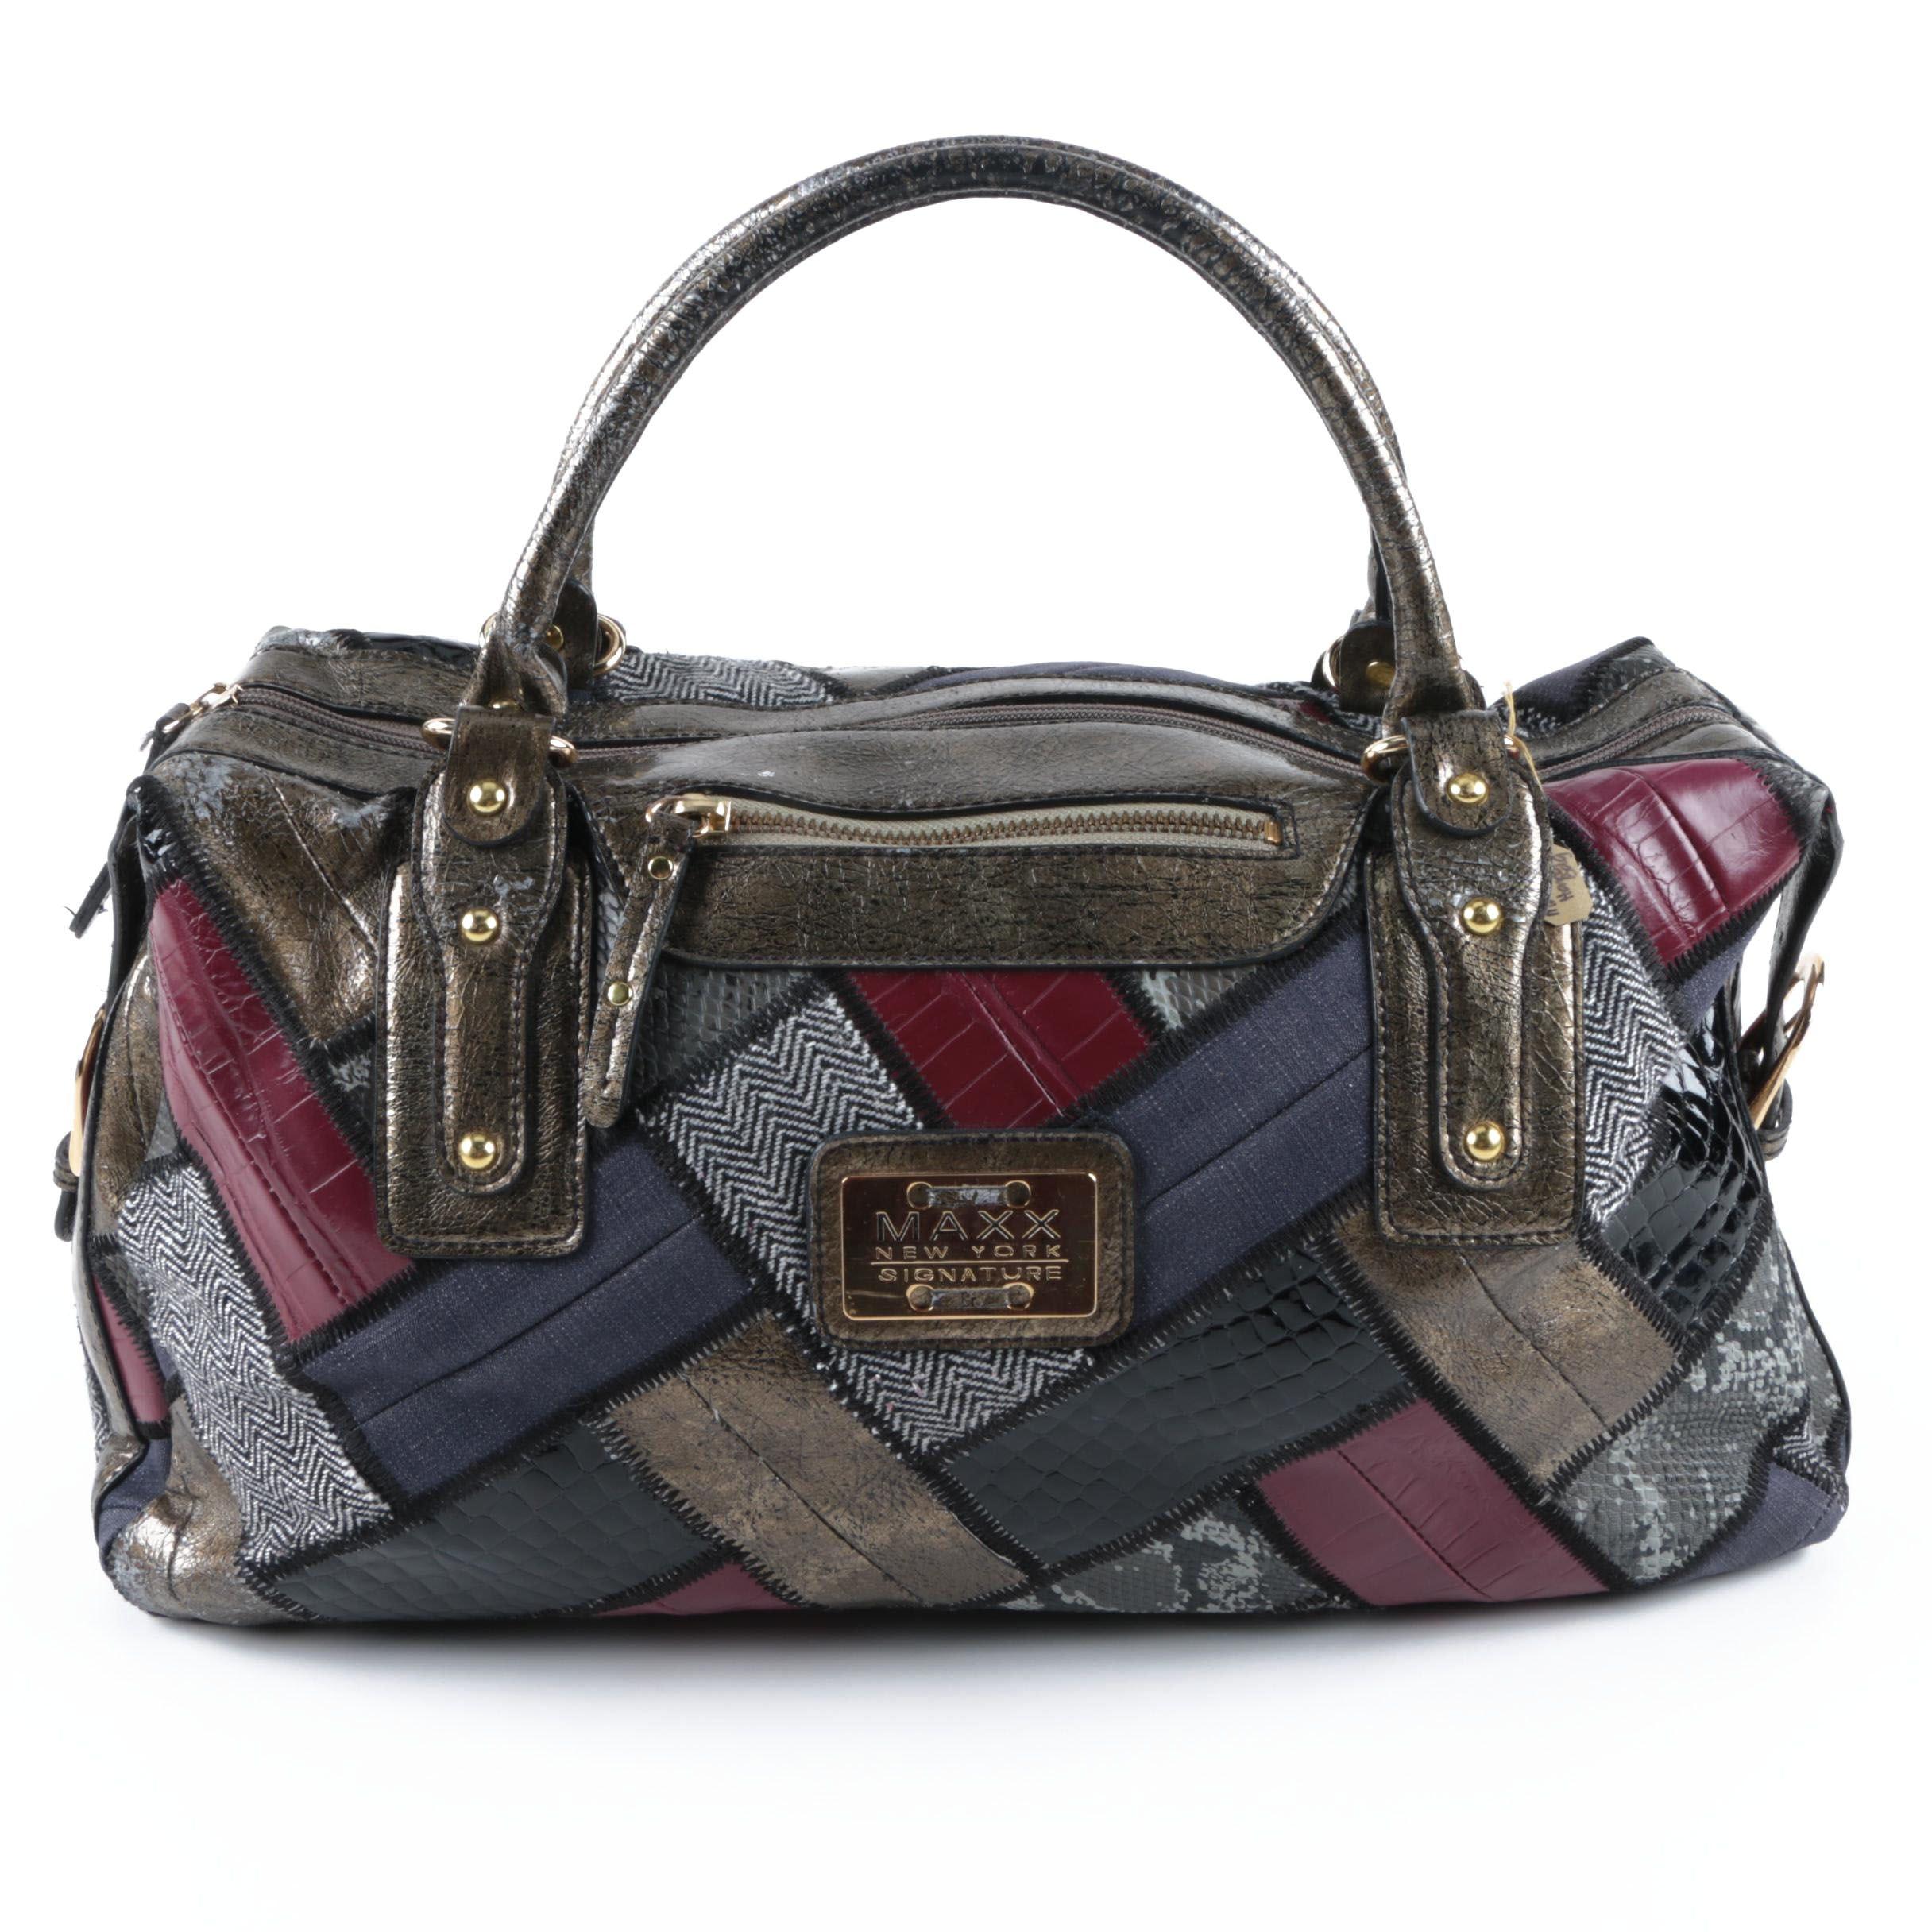 Maxx New York Patchwork Handbag